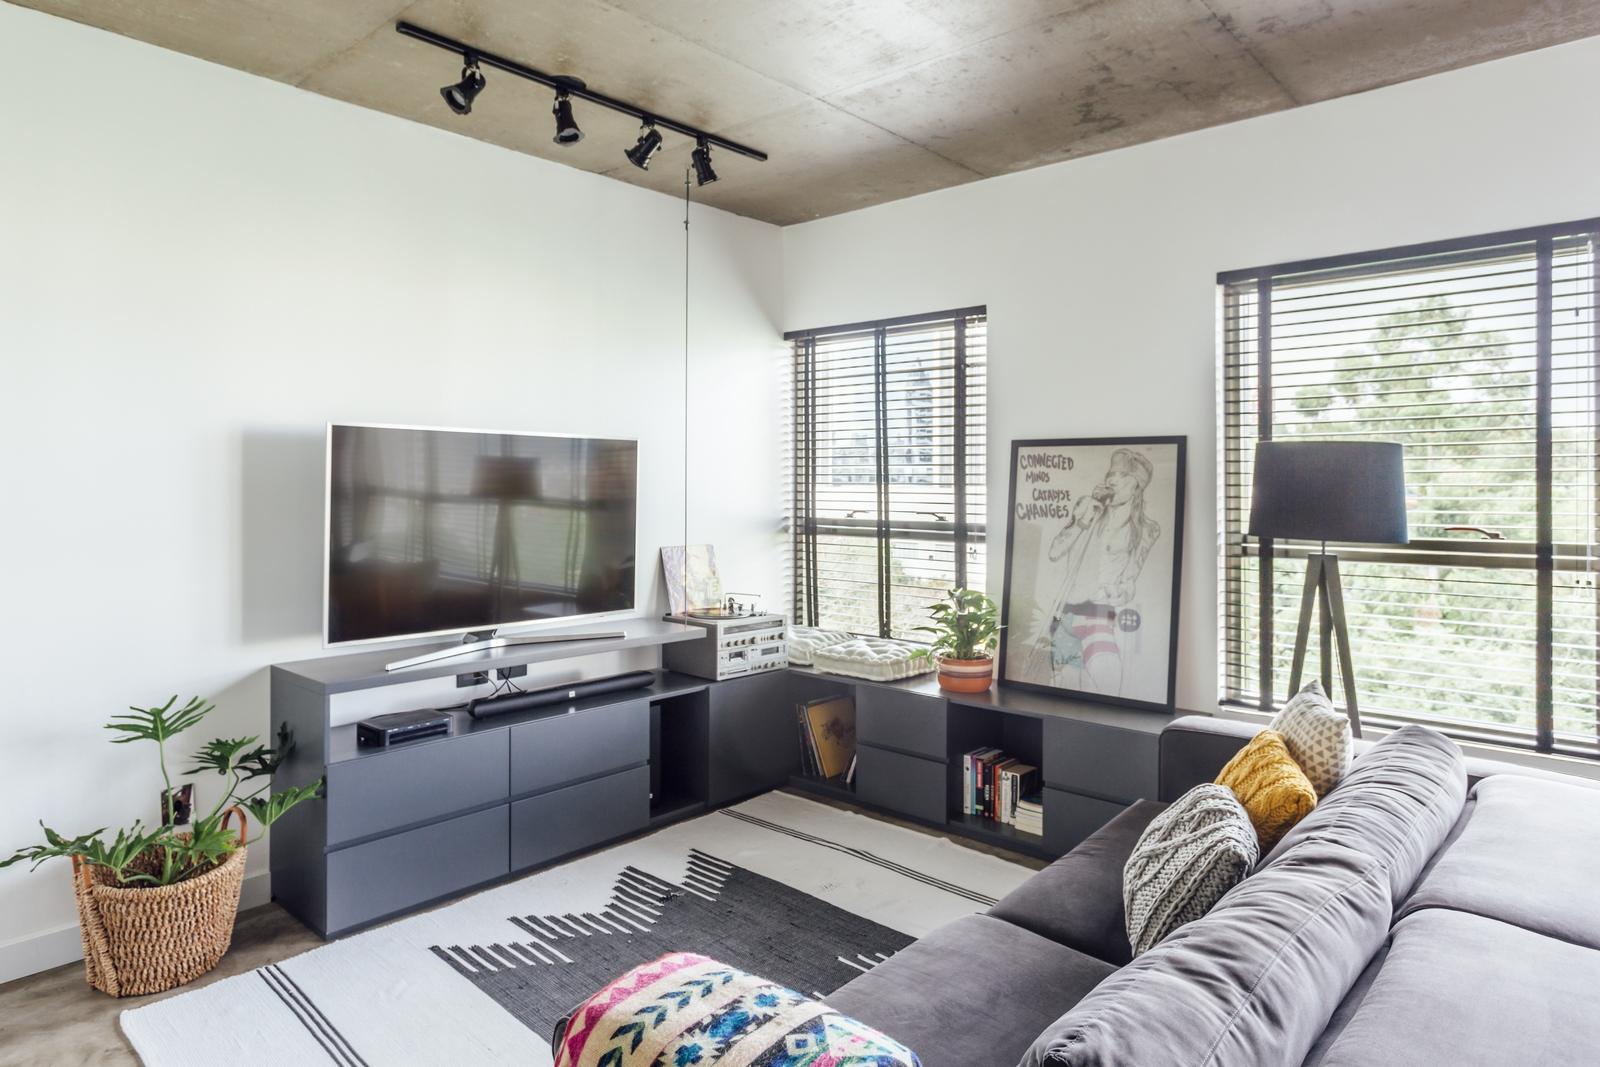 Apartamento Maxhaus -8 (Copiar)